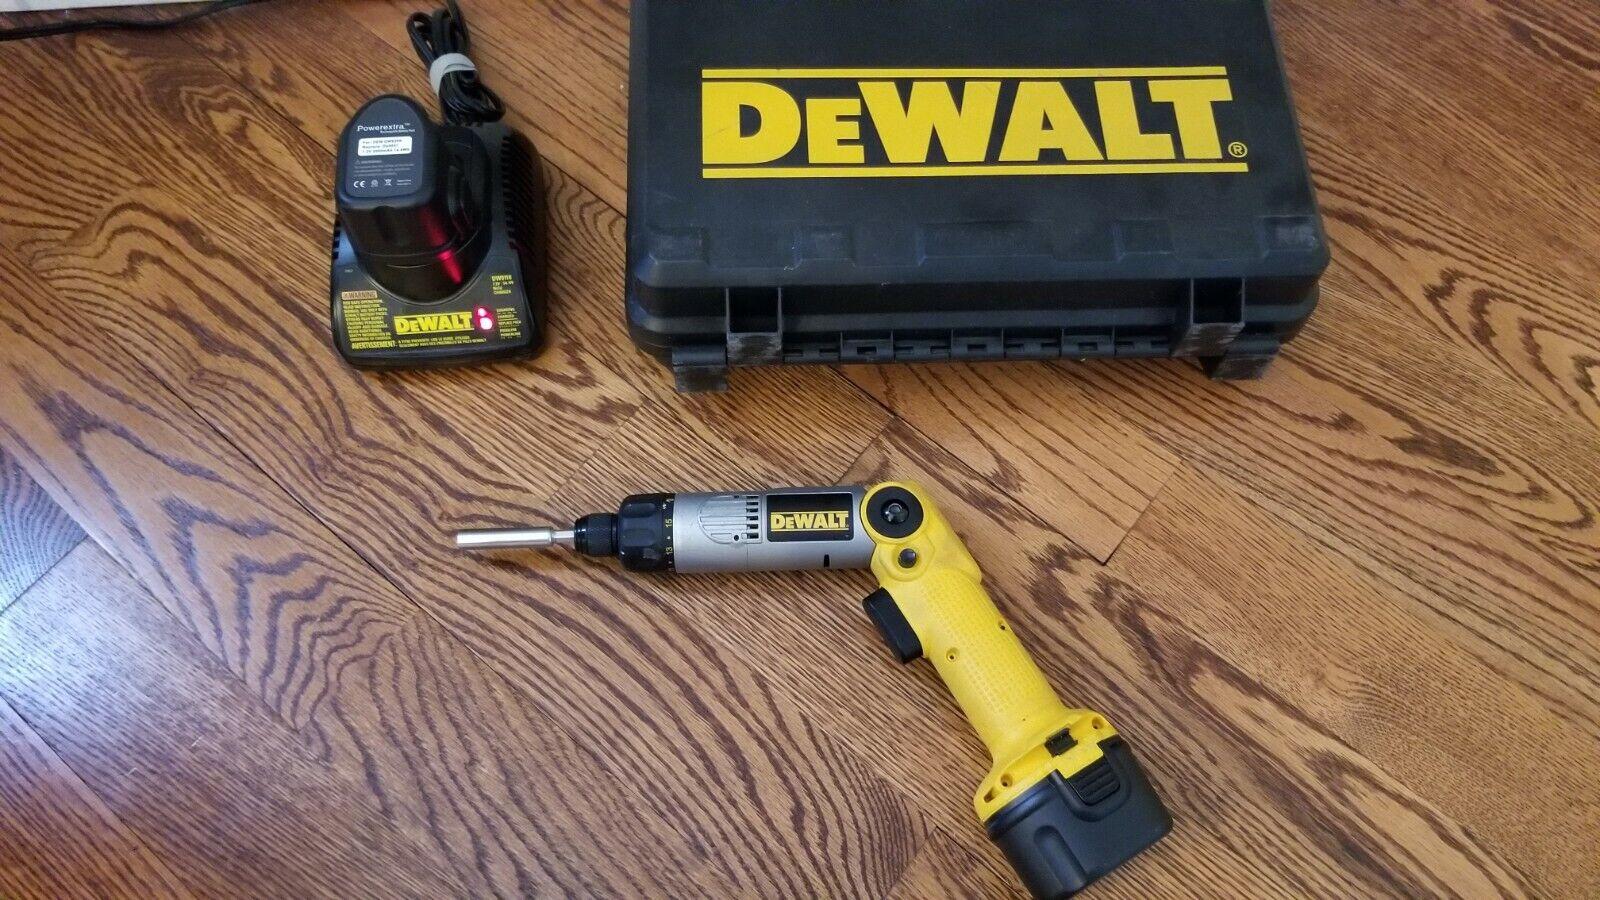 Dewalt 7.2 cordless screwdriver 2007 nissan altima headlight bulb replacement